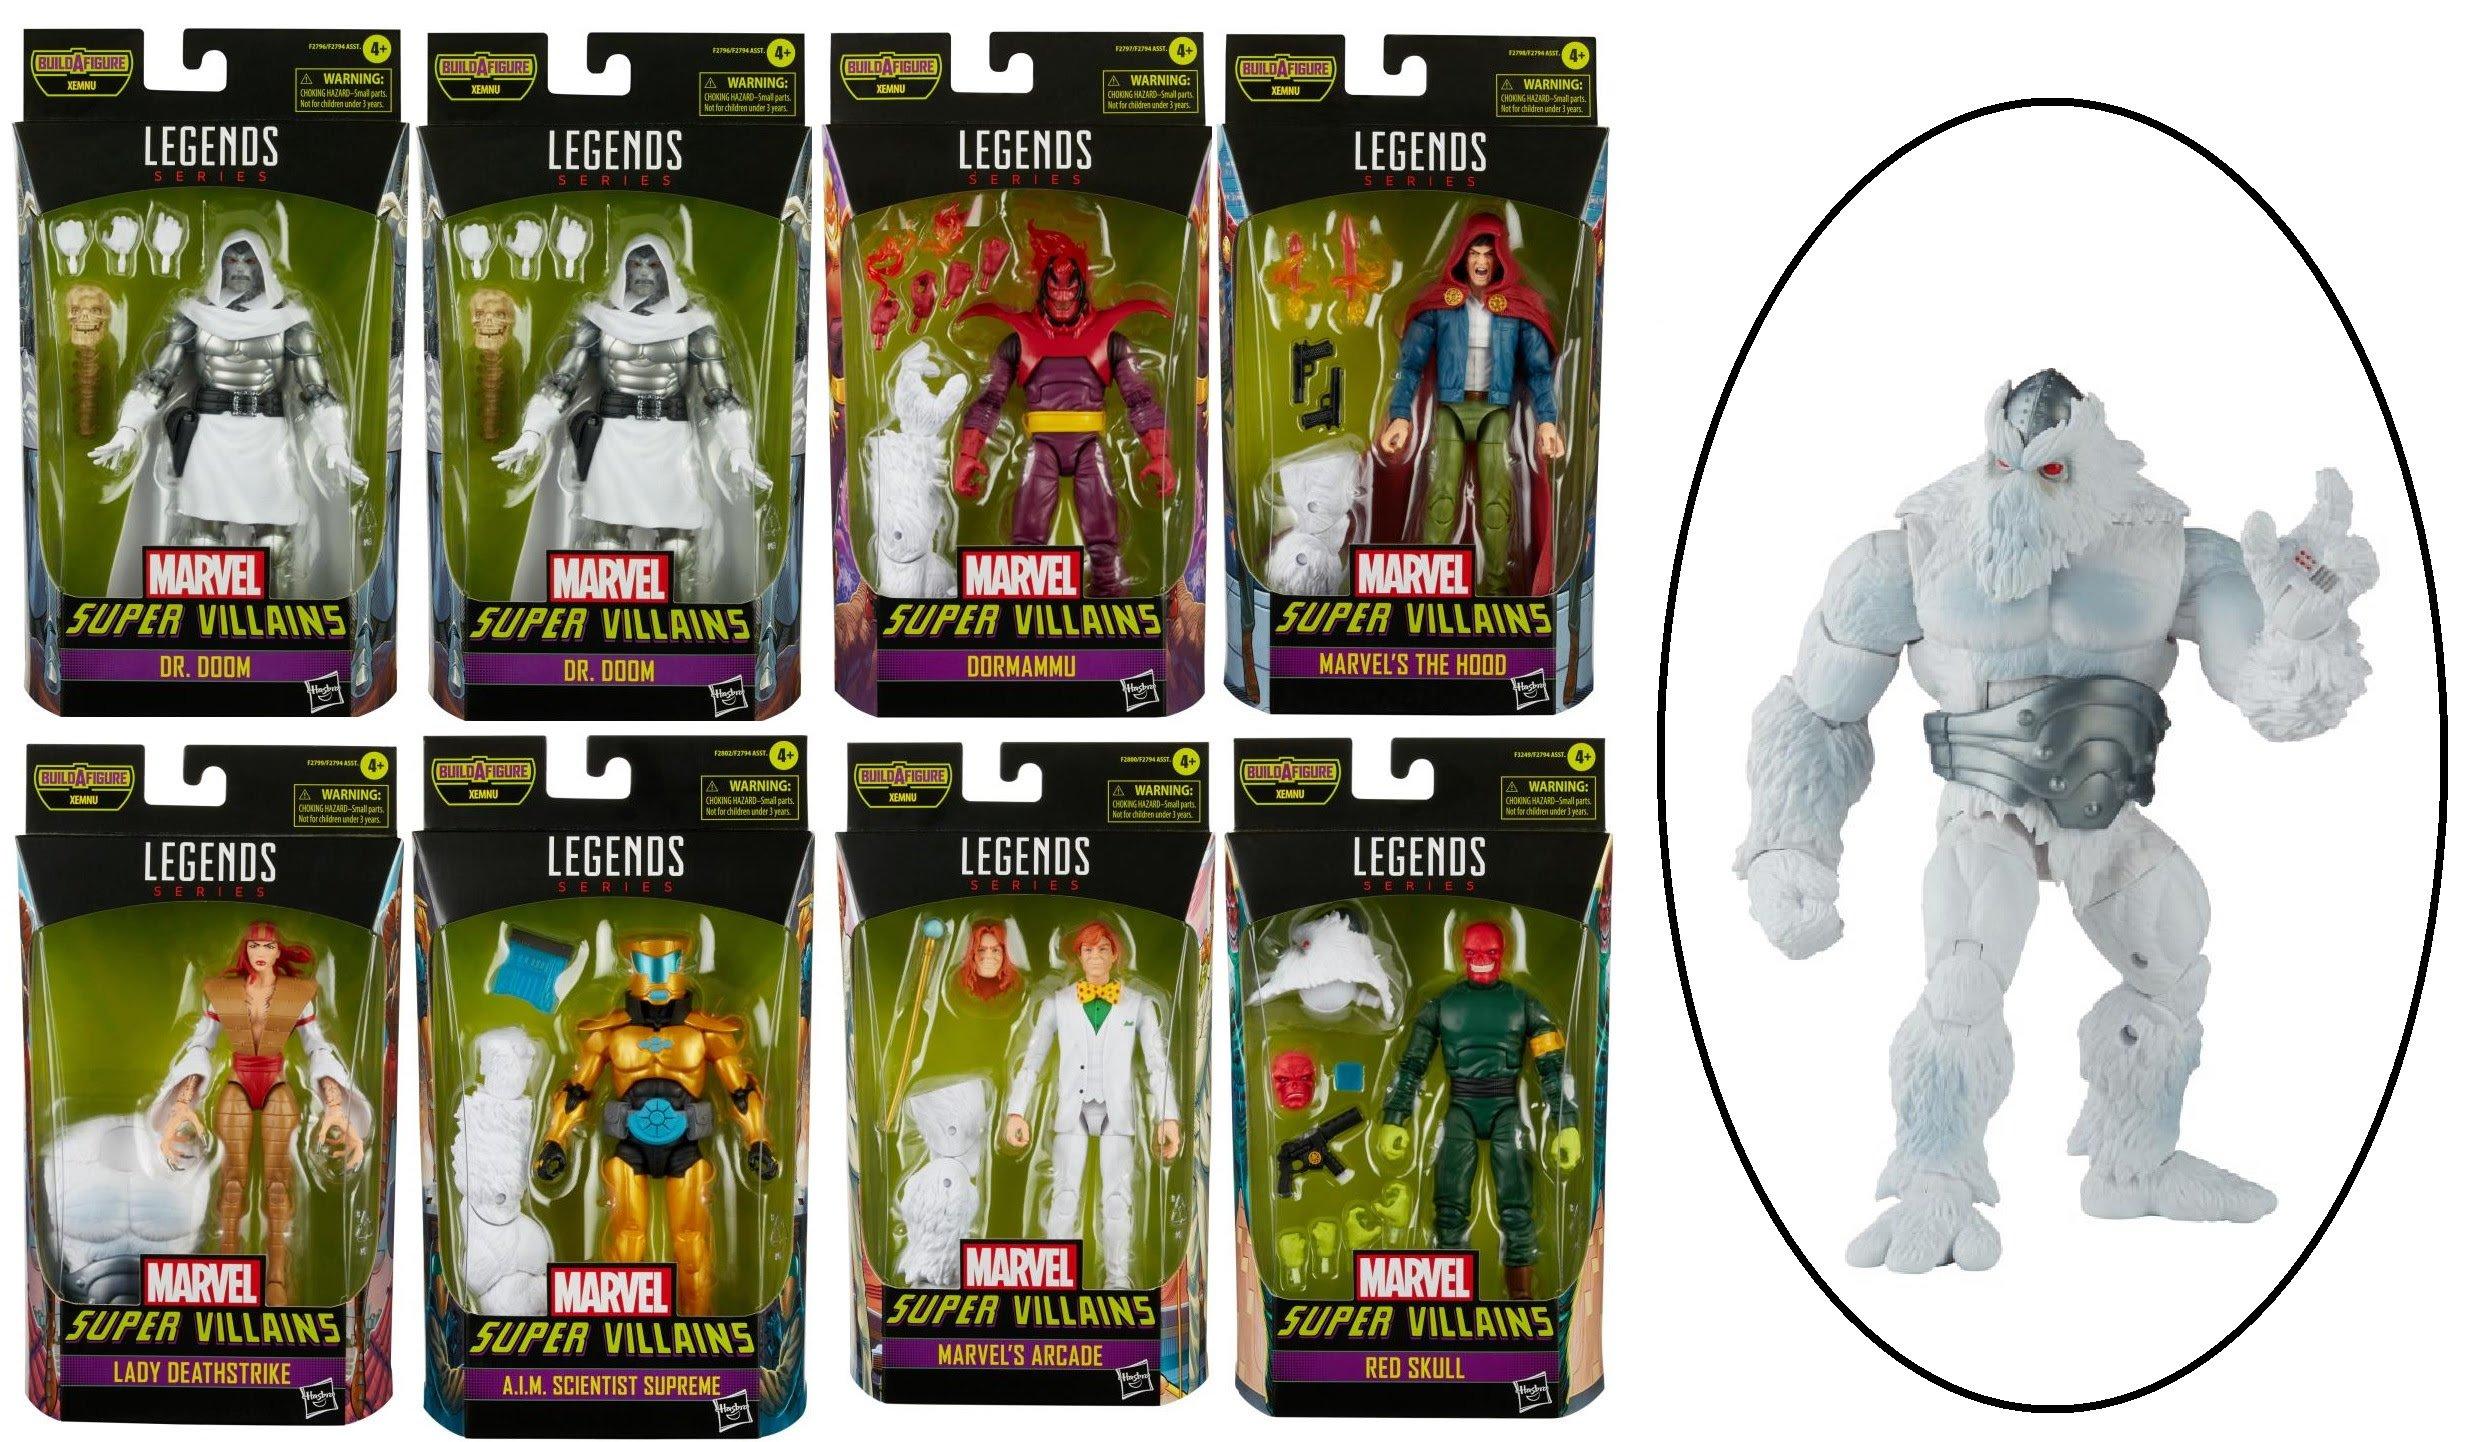 Marvel Legends - Supper Villians Action Figures